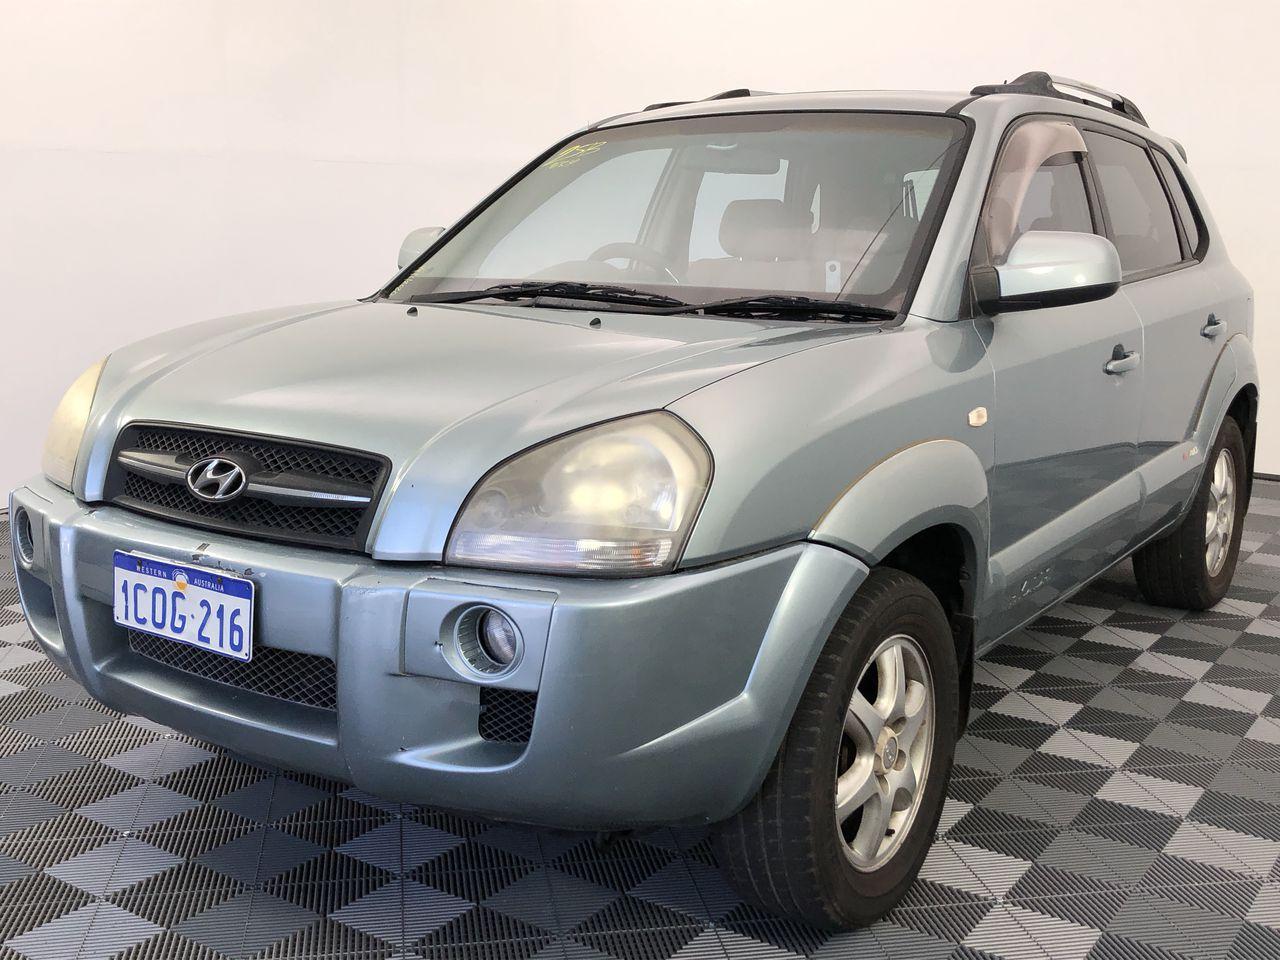 2005 Hyundai Tucson Elite Automatic Wagon (WOVR+Inspected)